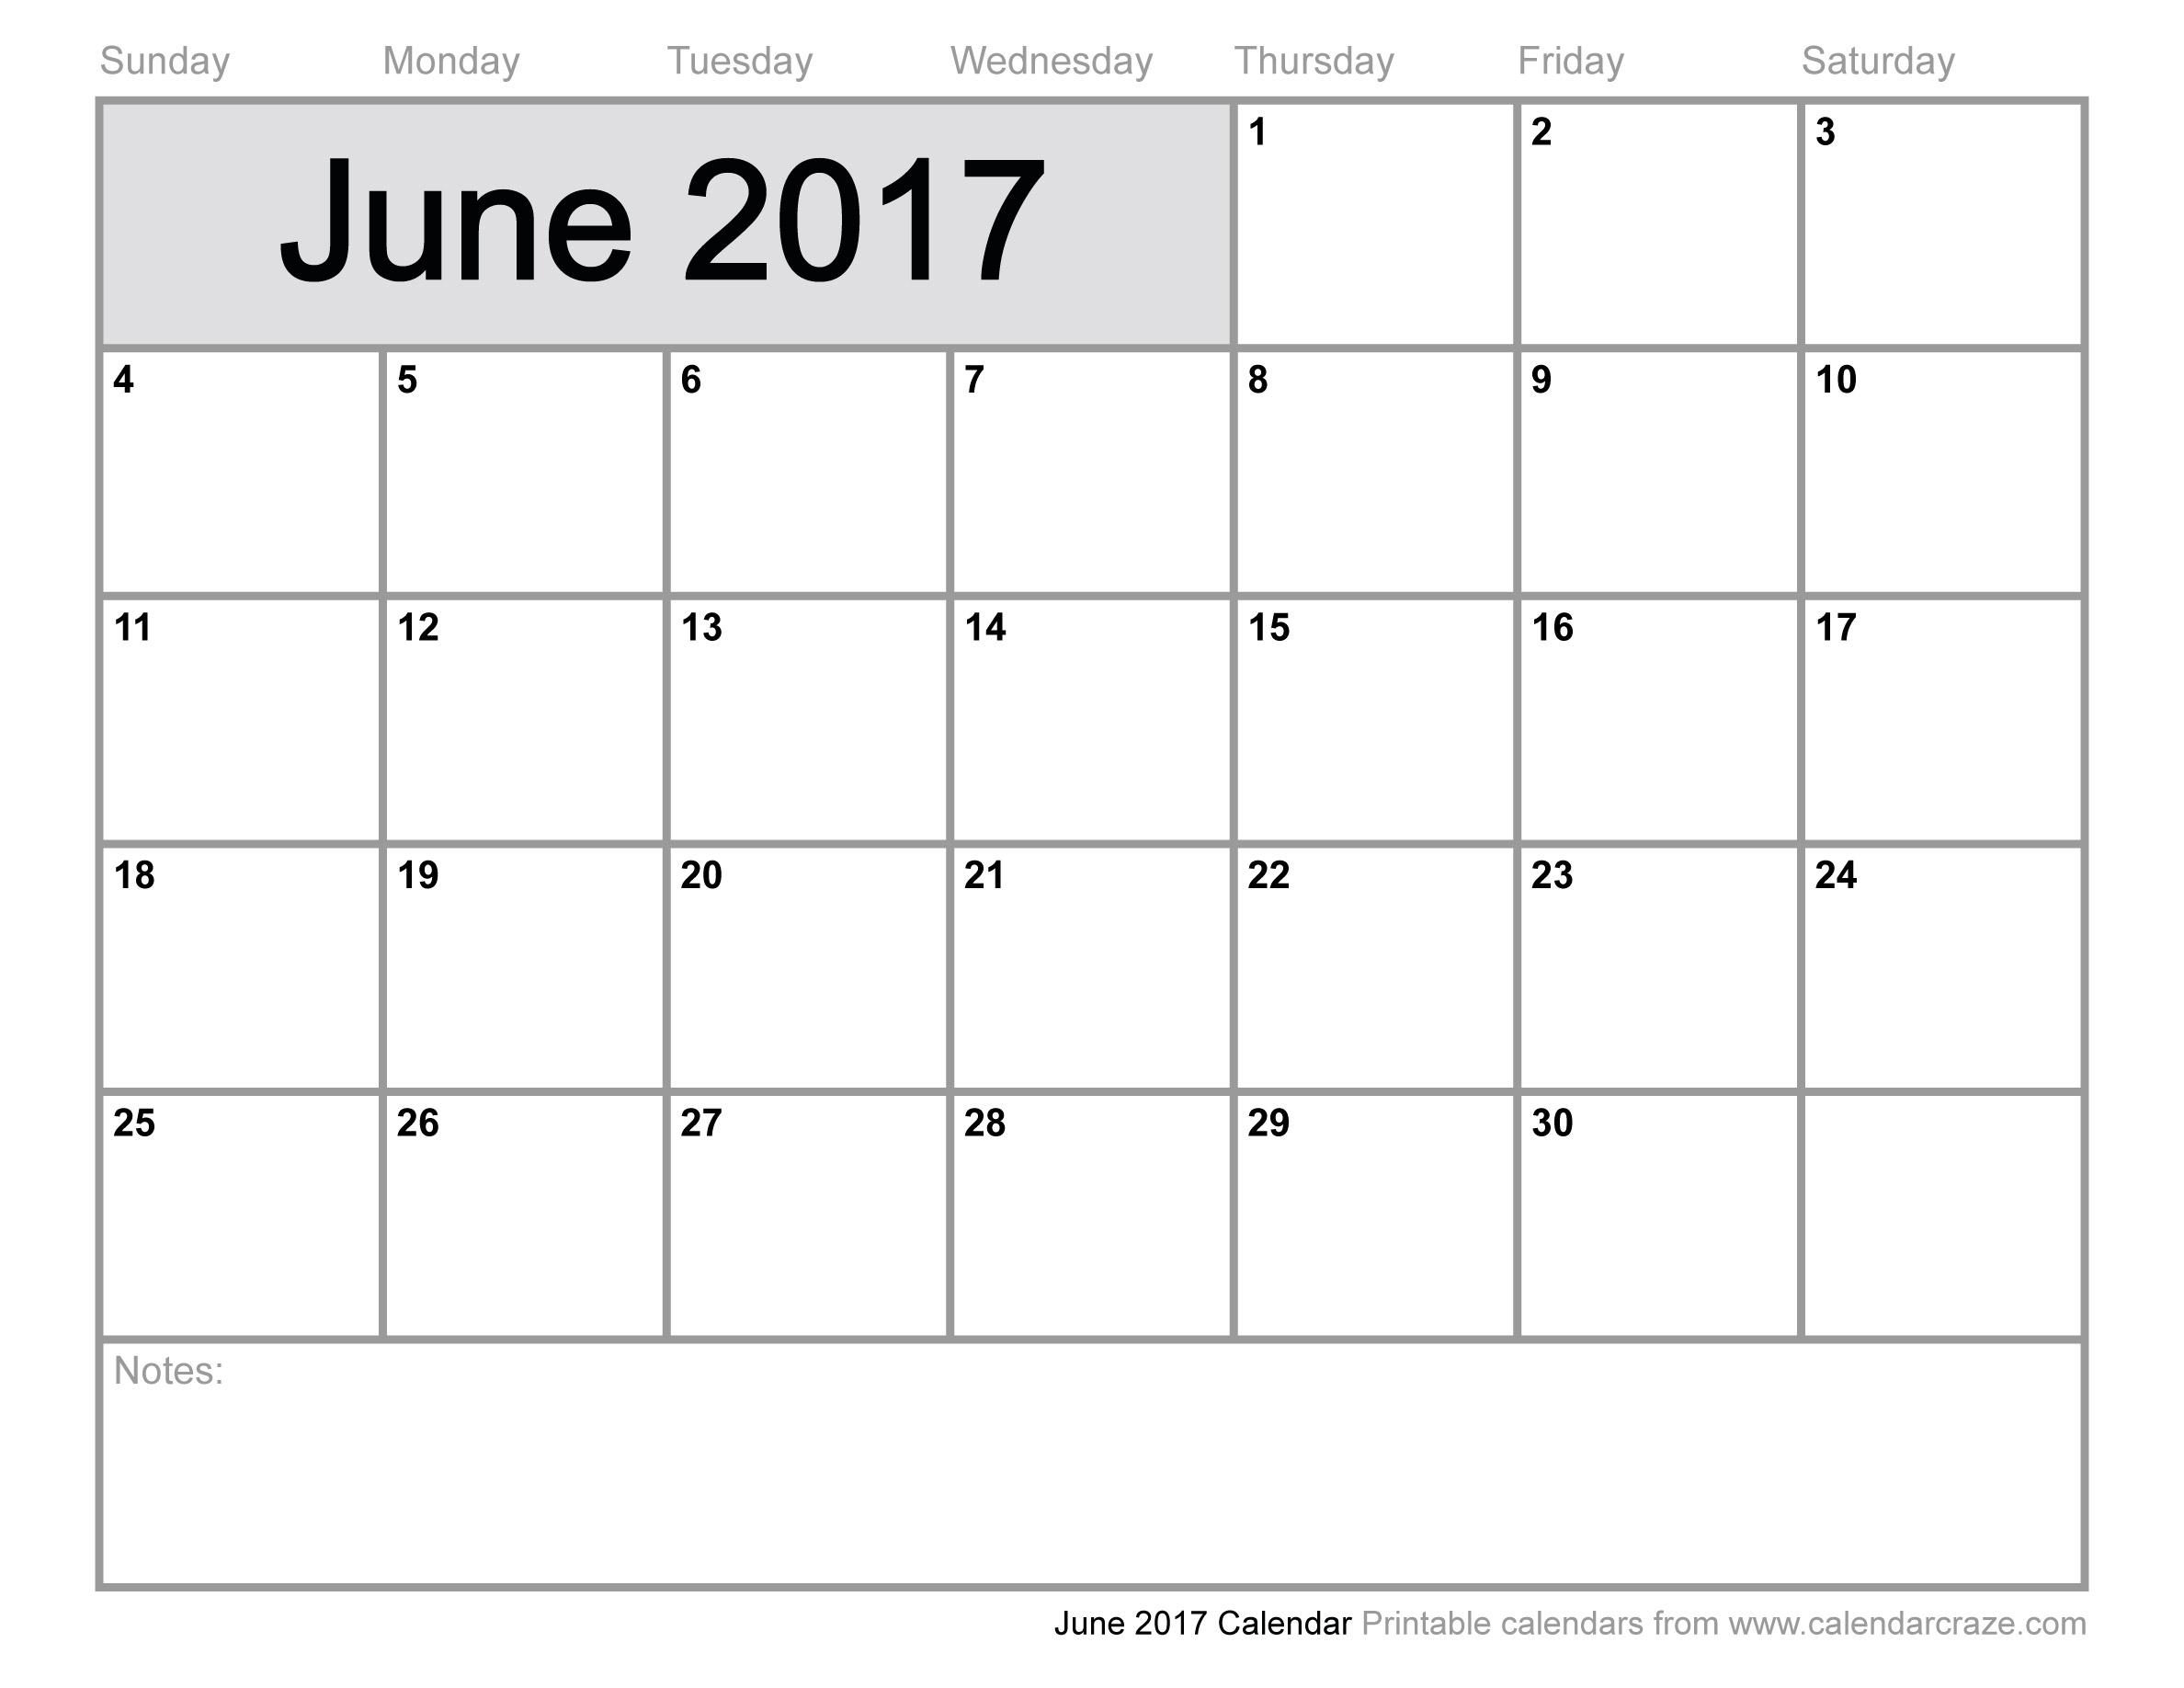 June 2017 Calendar Pdf | Printable 2017 Calendars regarding Blanket Calender Printables For December